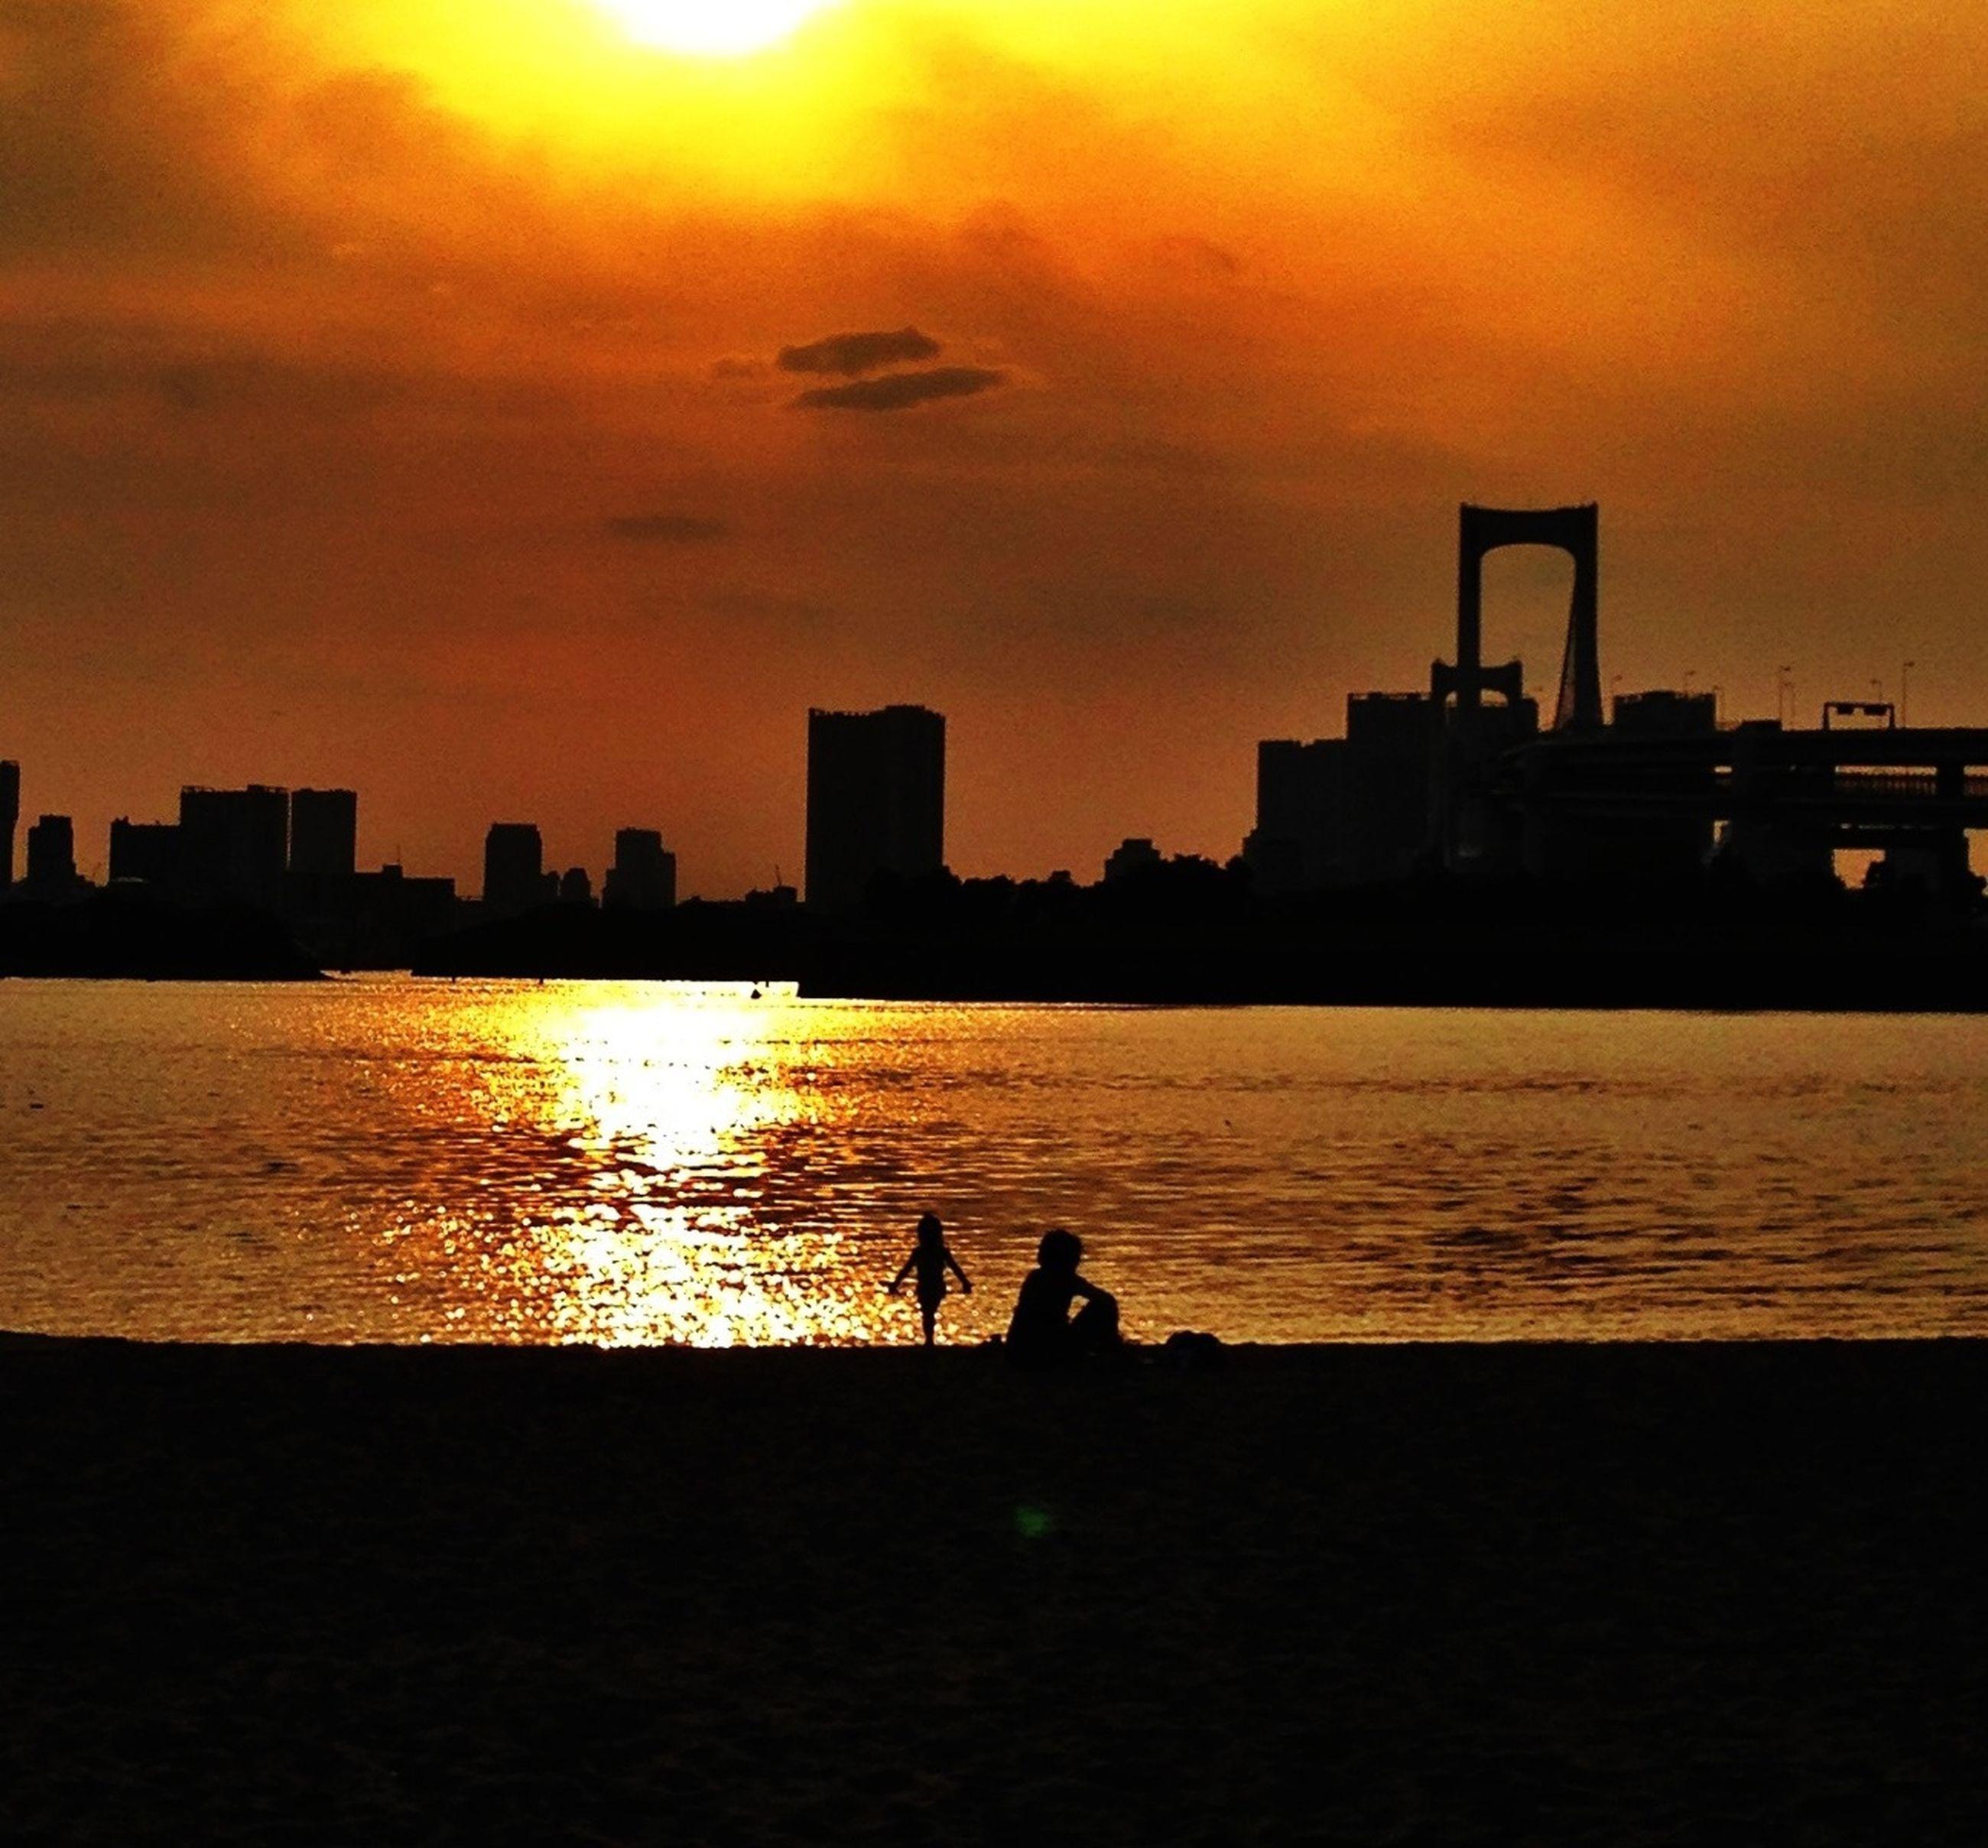 sunset, silhouette, water, orange color, sky, architecture, built structure, building exterior, men, sun, city, reflection, lifestyles, river, leisure activity, scenics, sea, beauty in nature, nature